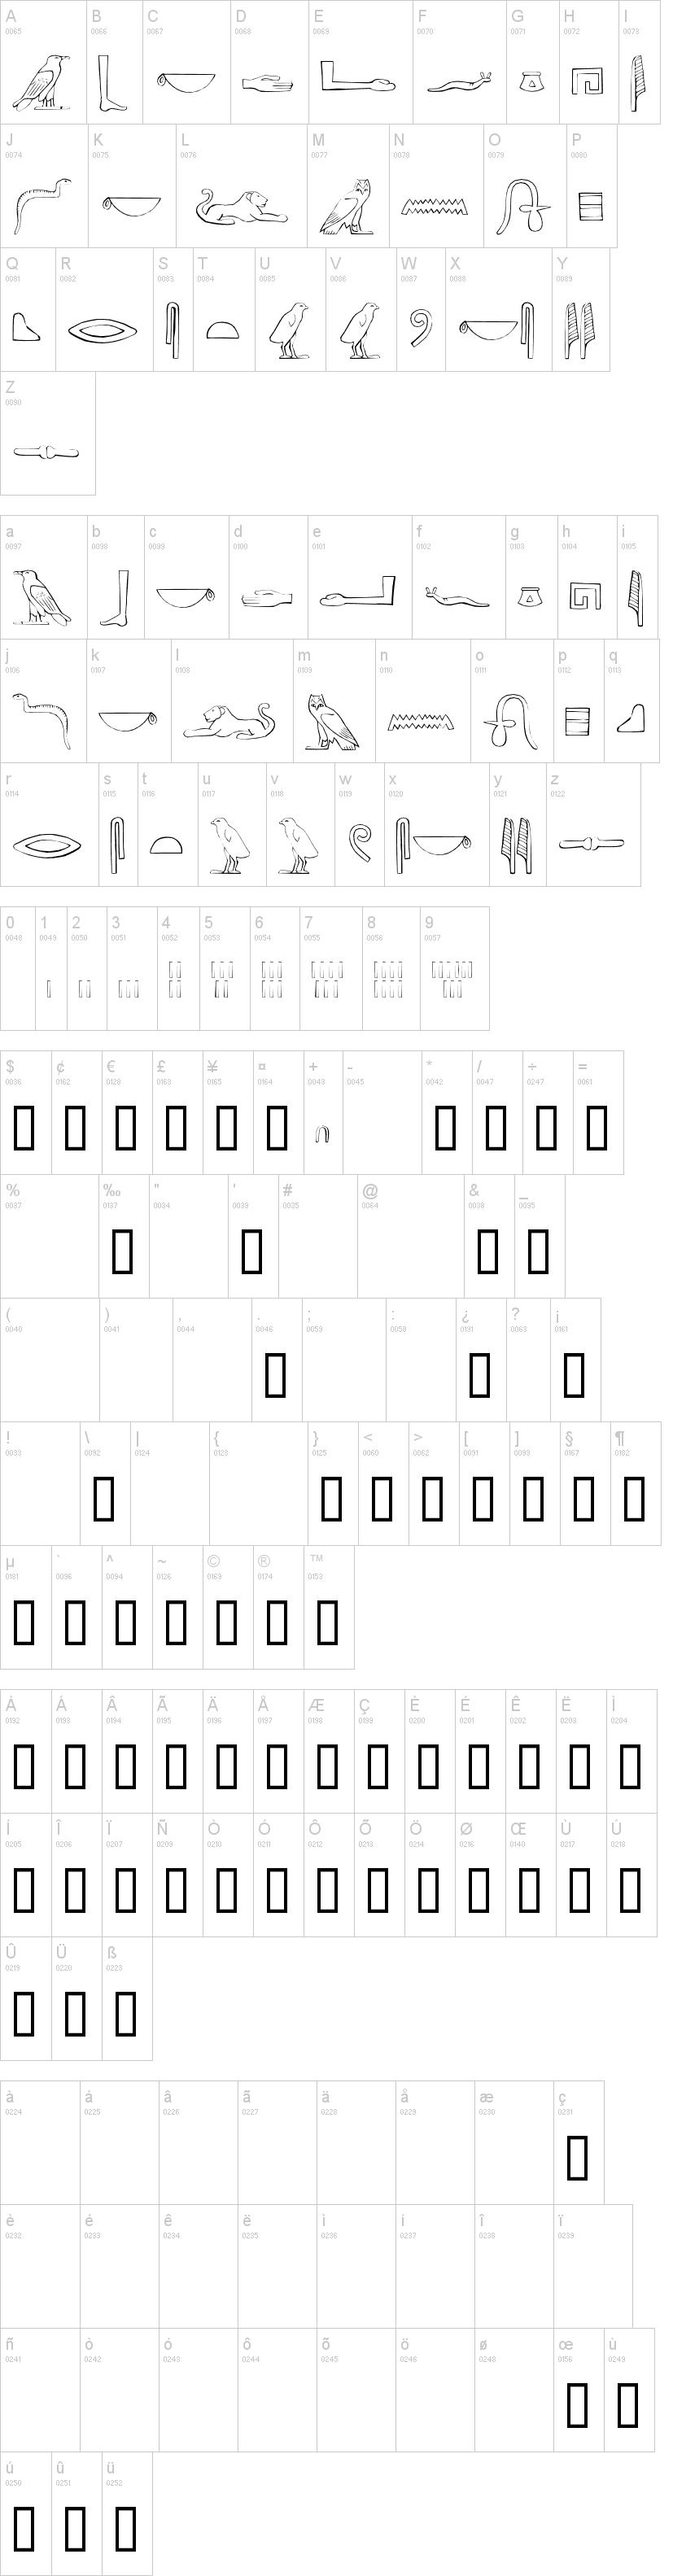 Ancient egyptian hieroglyphs font dafont ancient egyptian hieroglyphs buycottarizona